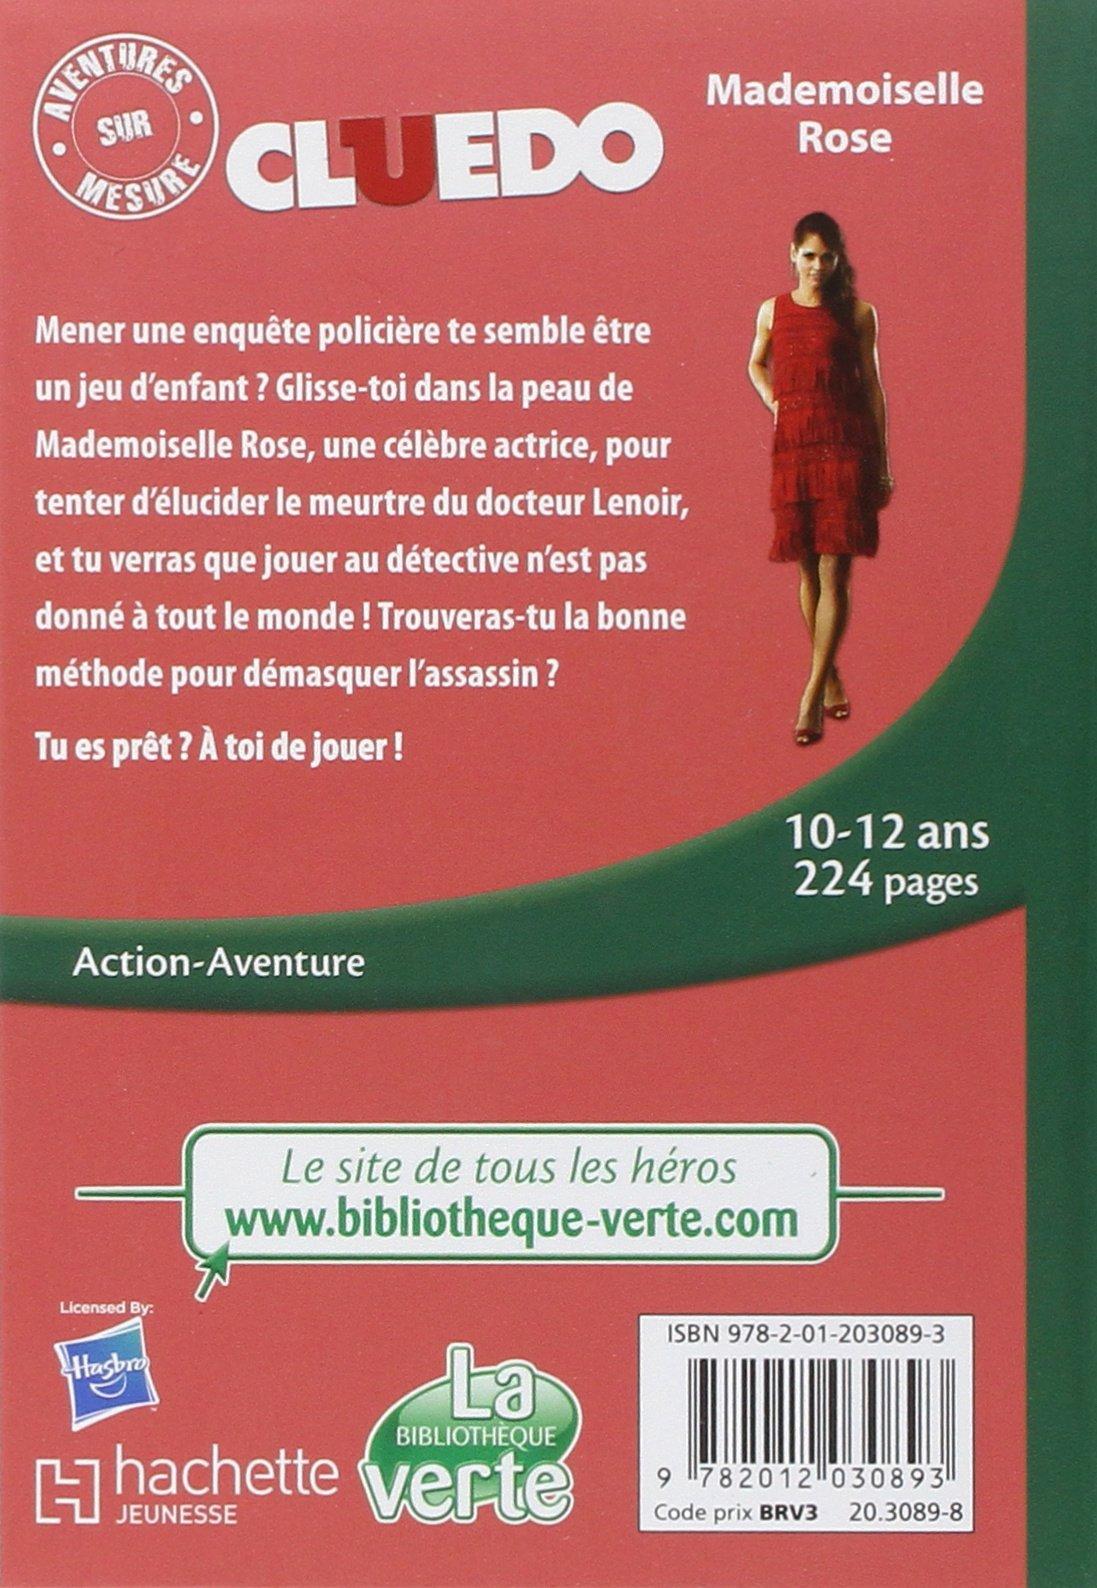 Aventures sur Mesure Cluedo 02 - Mademoiselle Rose Bibliothèque Verte Plus: Amazon.es: Hasbro: Libros en idiomas extranjeros